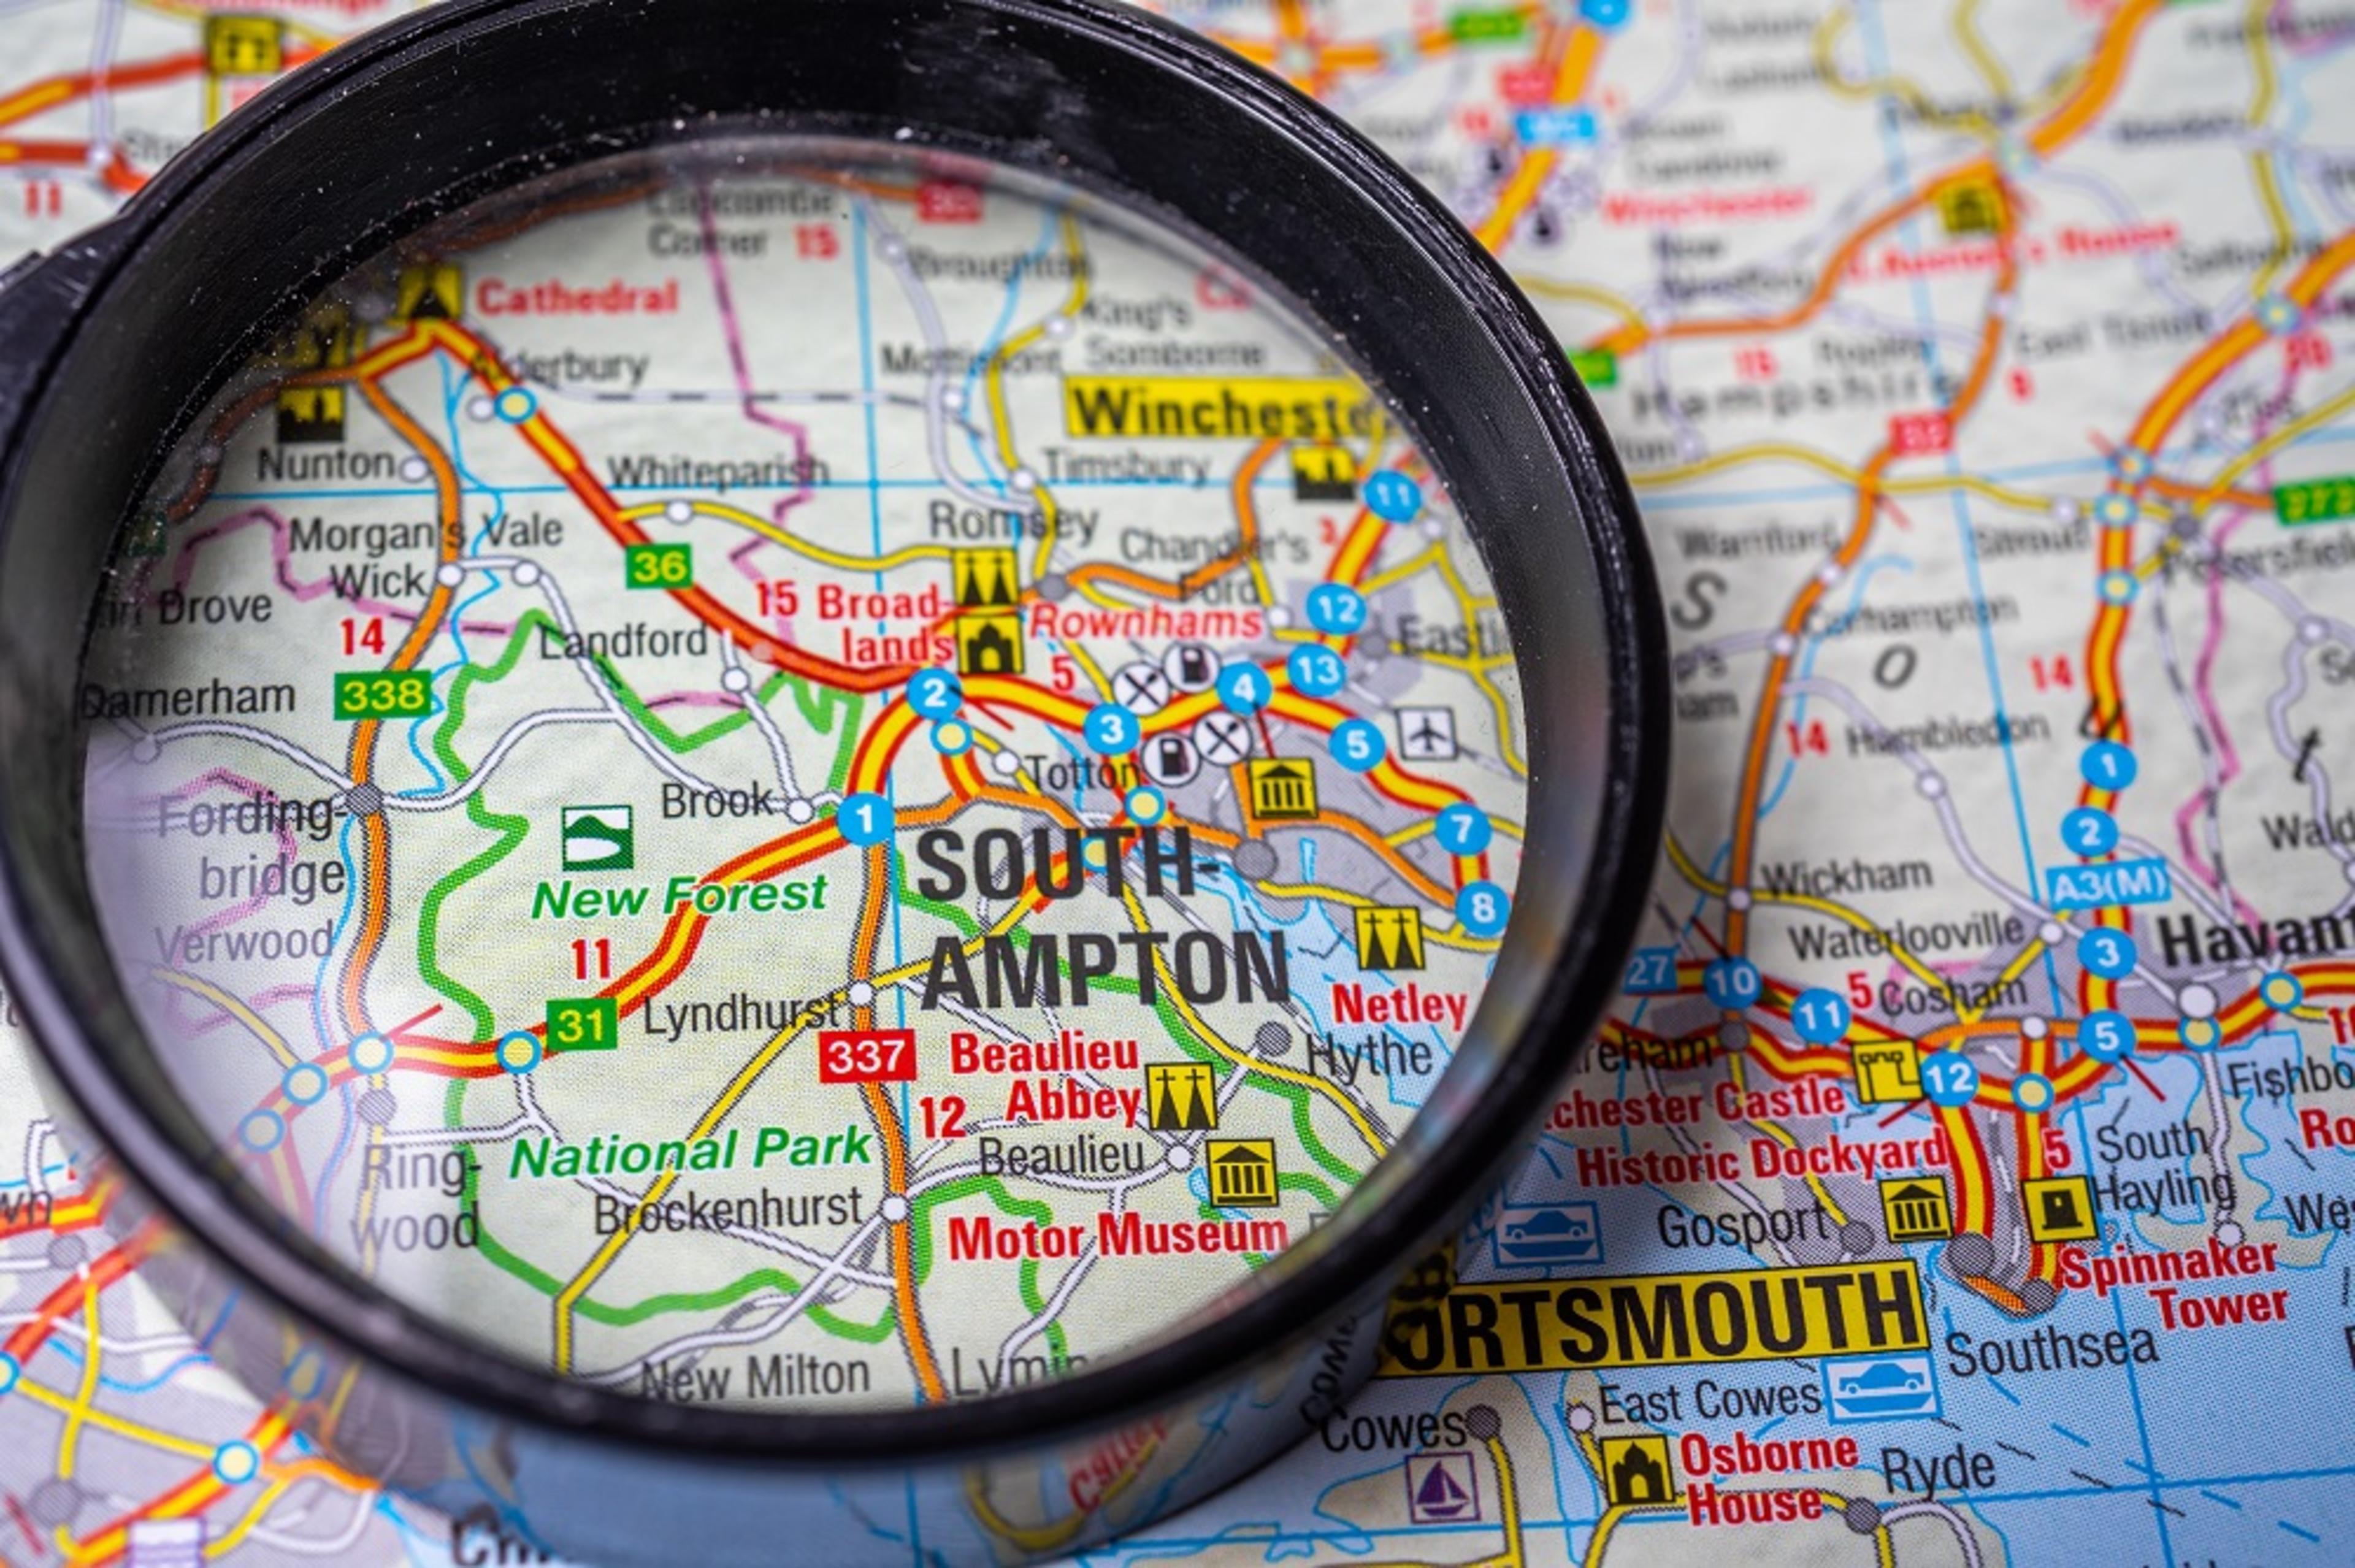 Southampton - connections